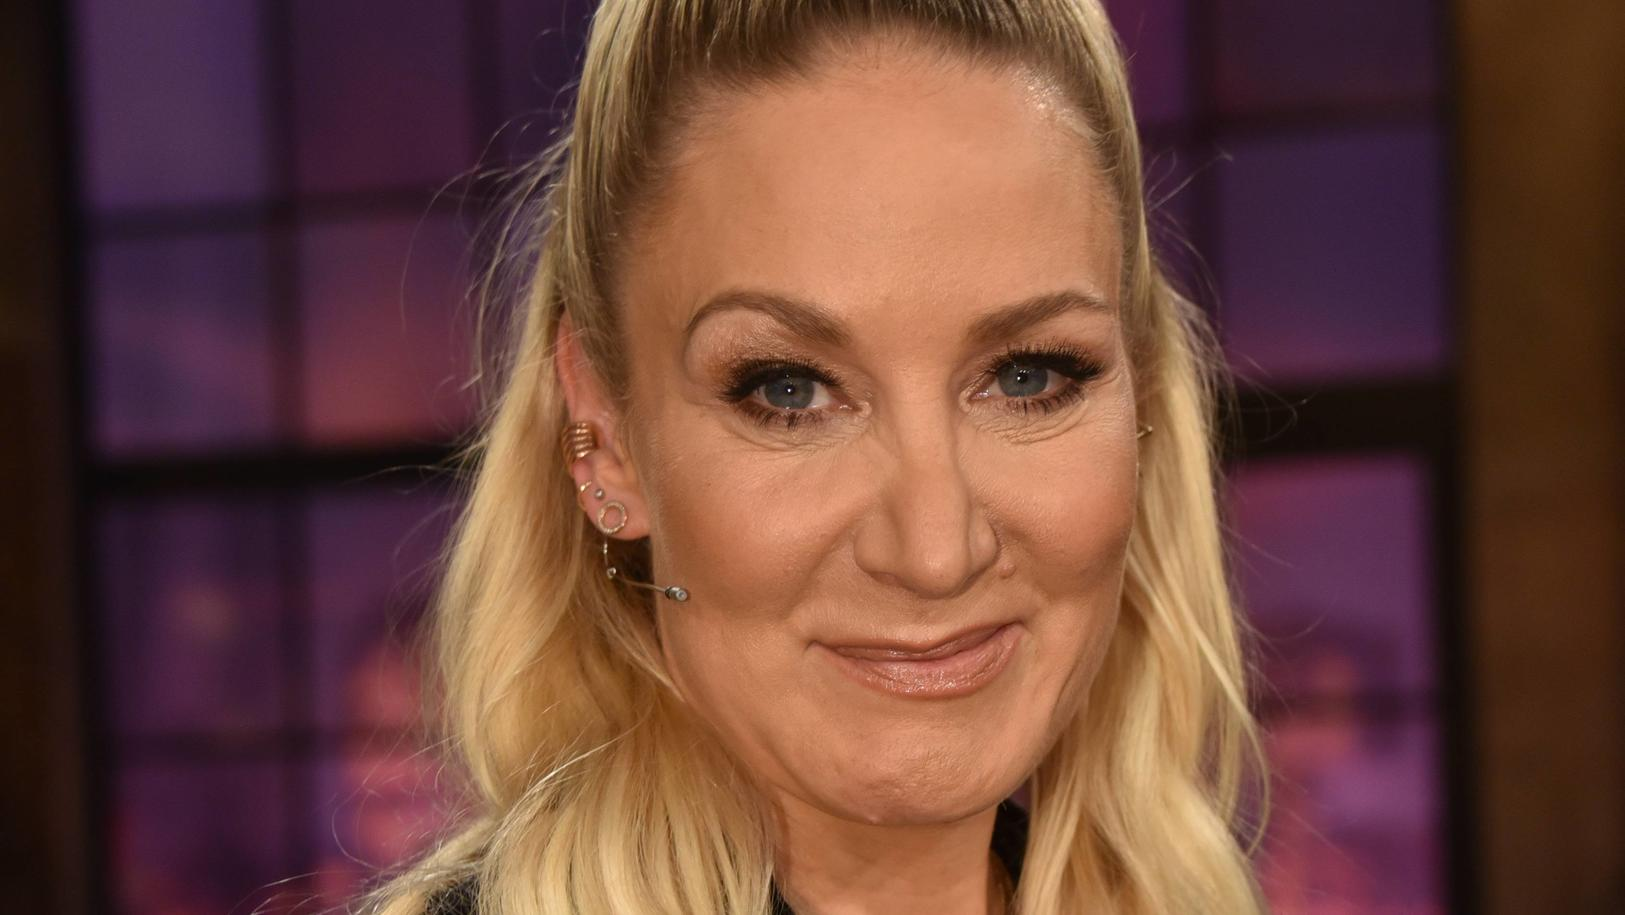 Schauspielerin Janine Kunze  (46) hat 3 Kinder